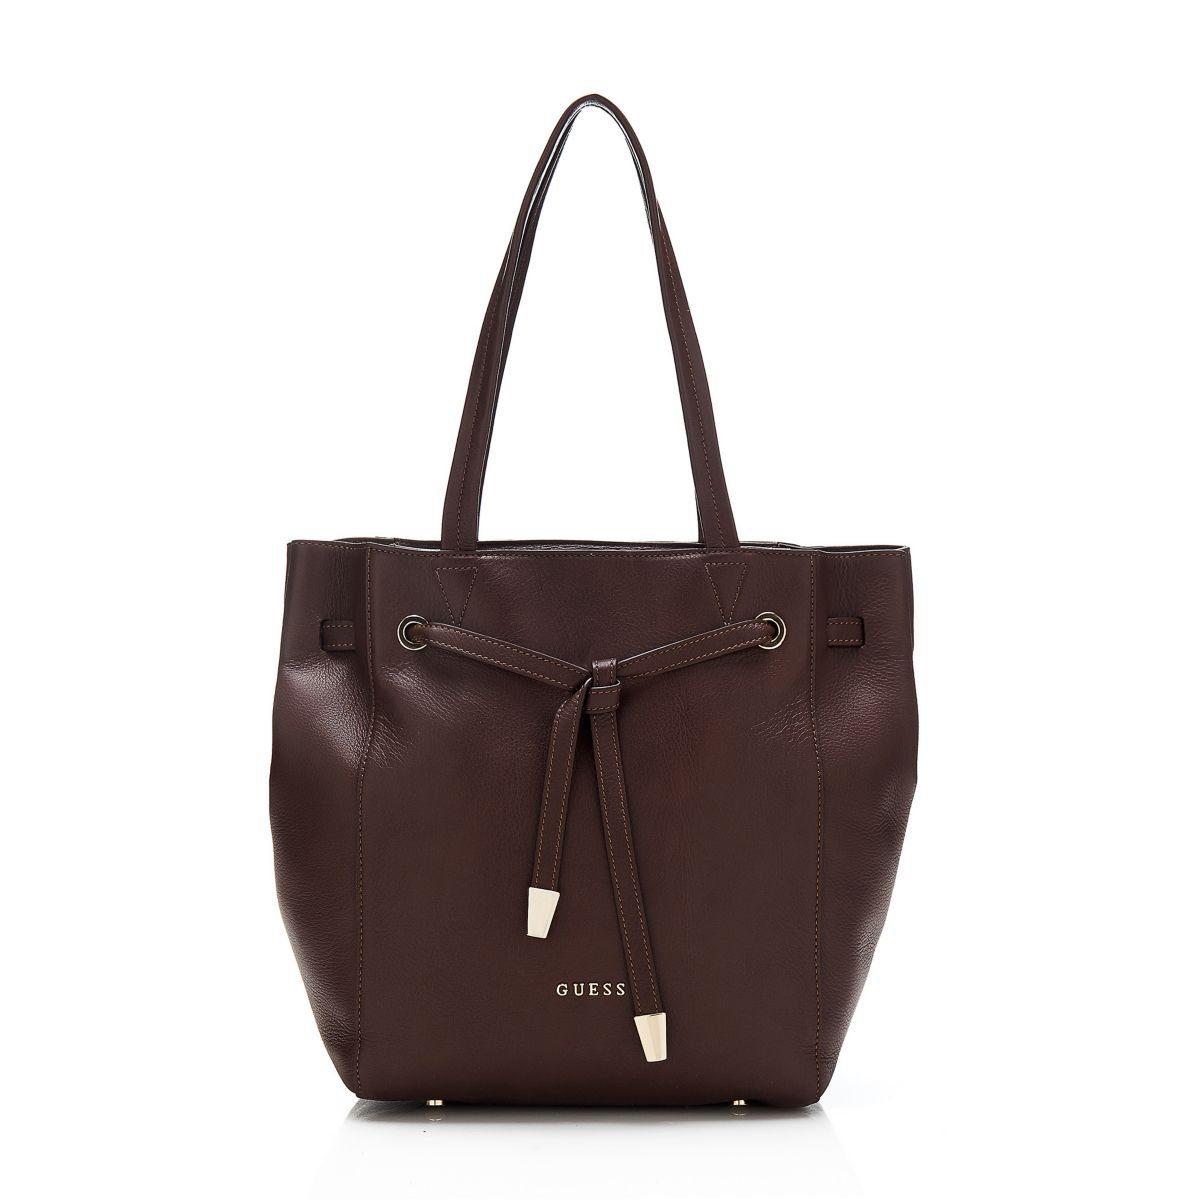 Guess Tasche Alessandra aus Leder